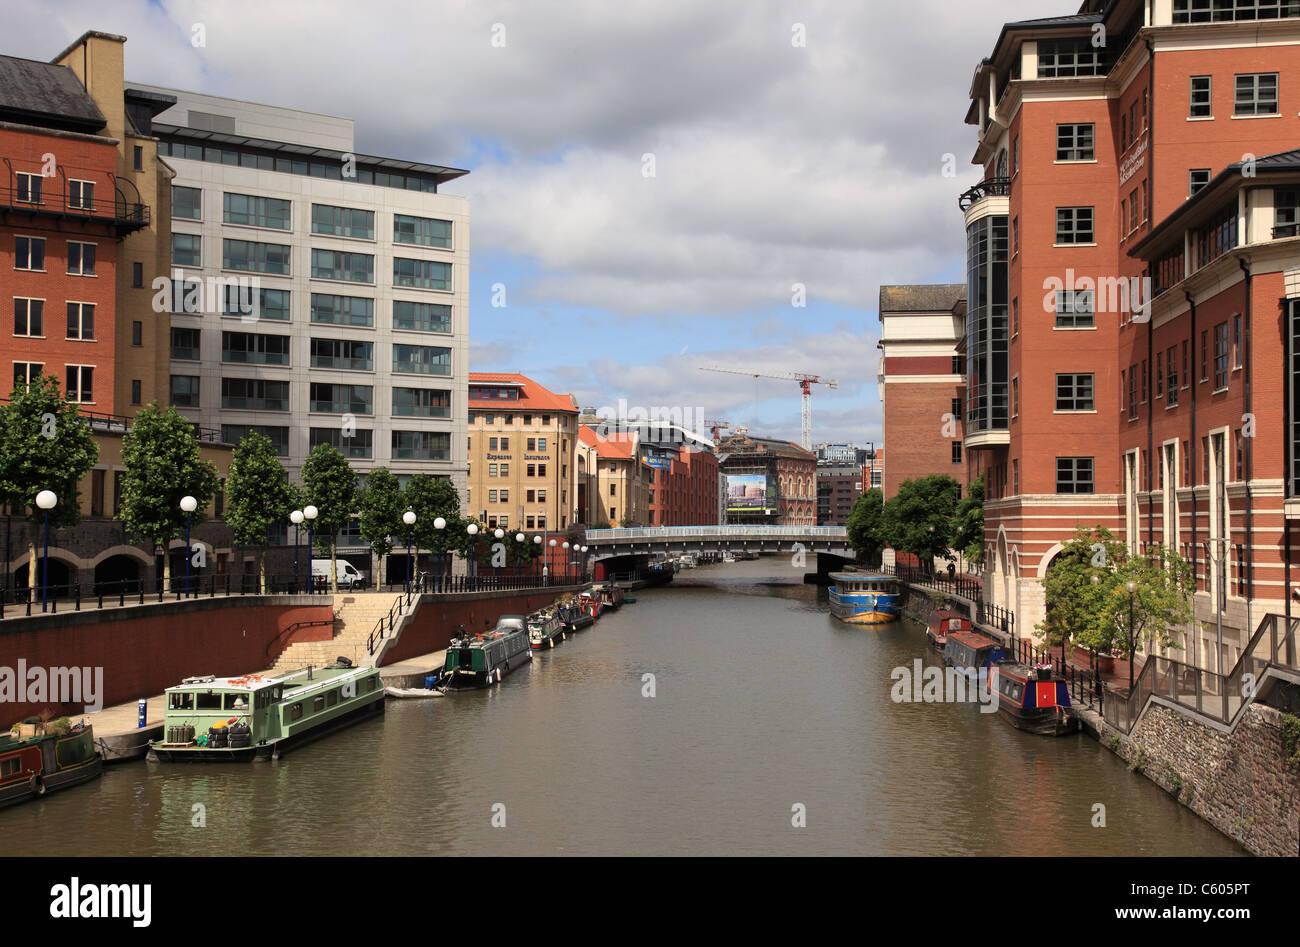 Temple Quay, Bristol city centre, England - Stock Image